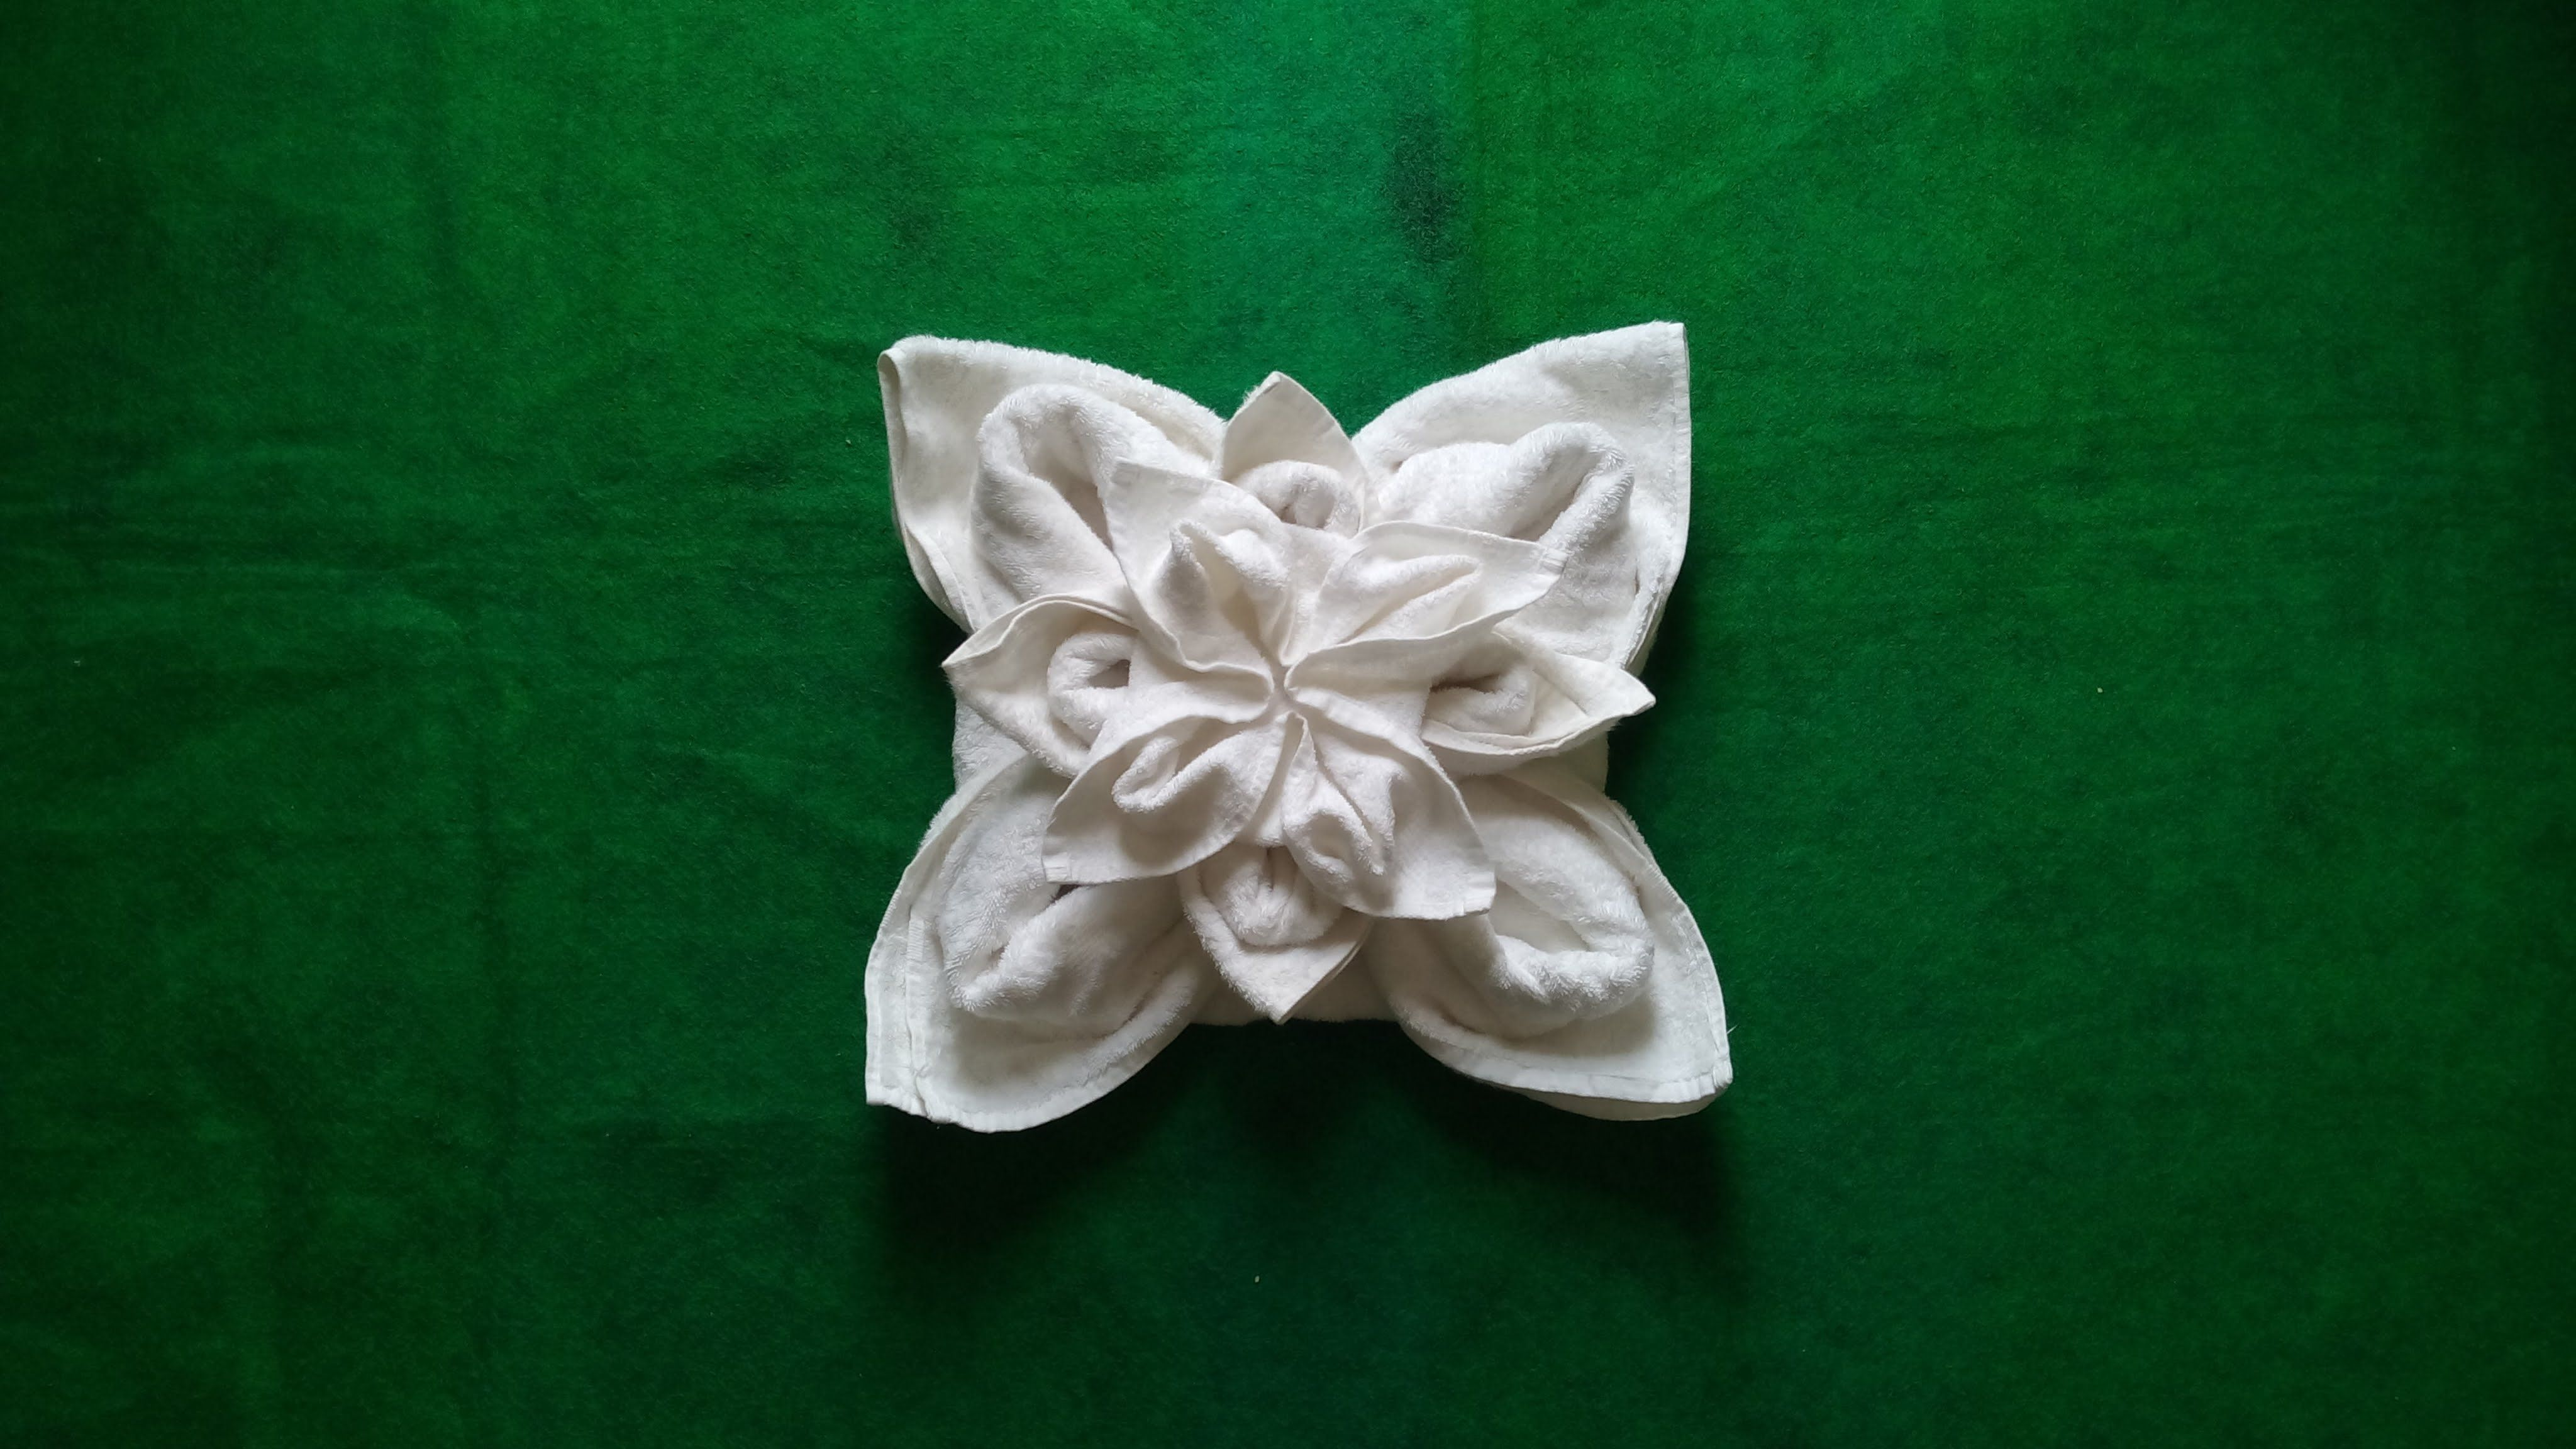 Lotus Flower Towel Origami Using One Large , One Medium